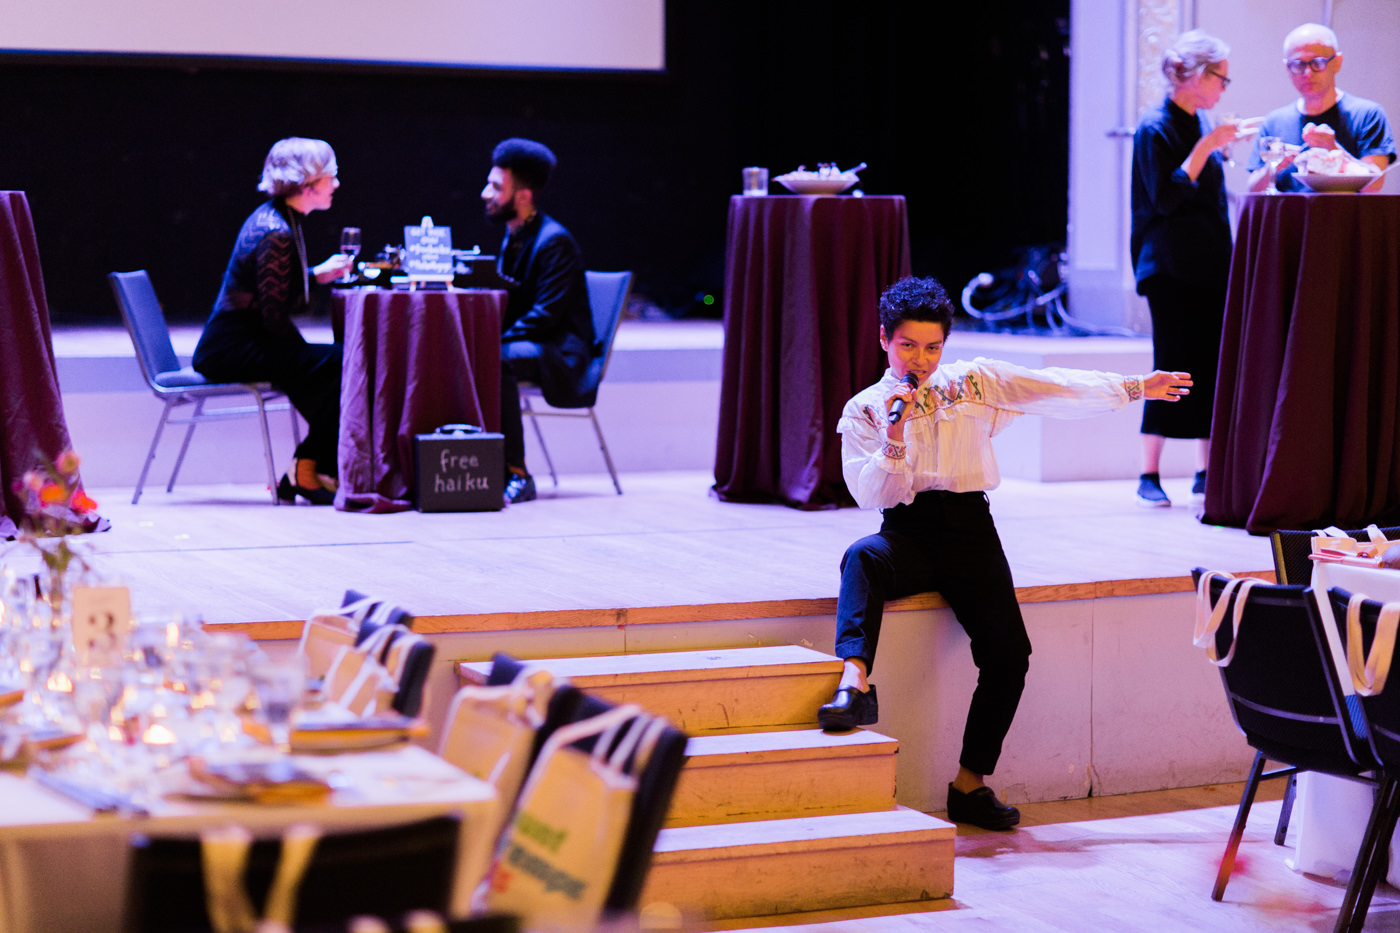 Mt Tremper Arts Gala -  NYC event photographer Kamp Weddings-3.jpg